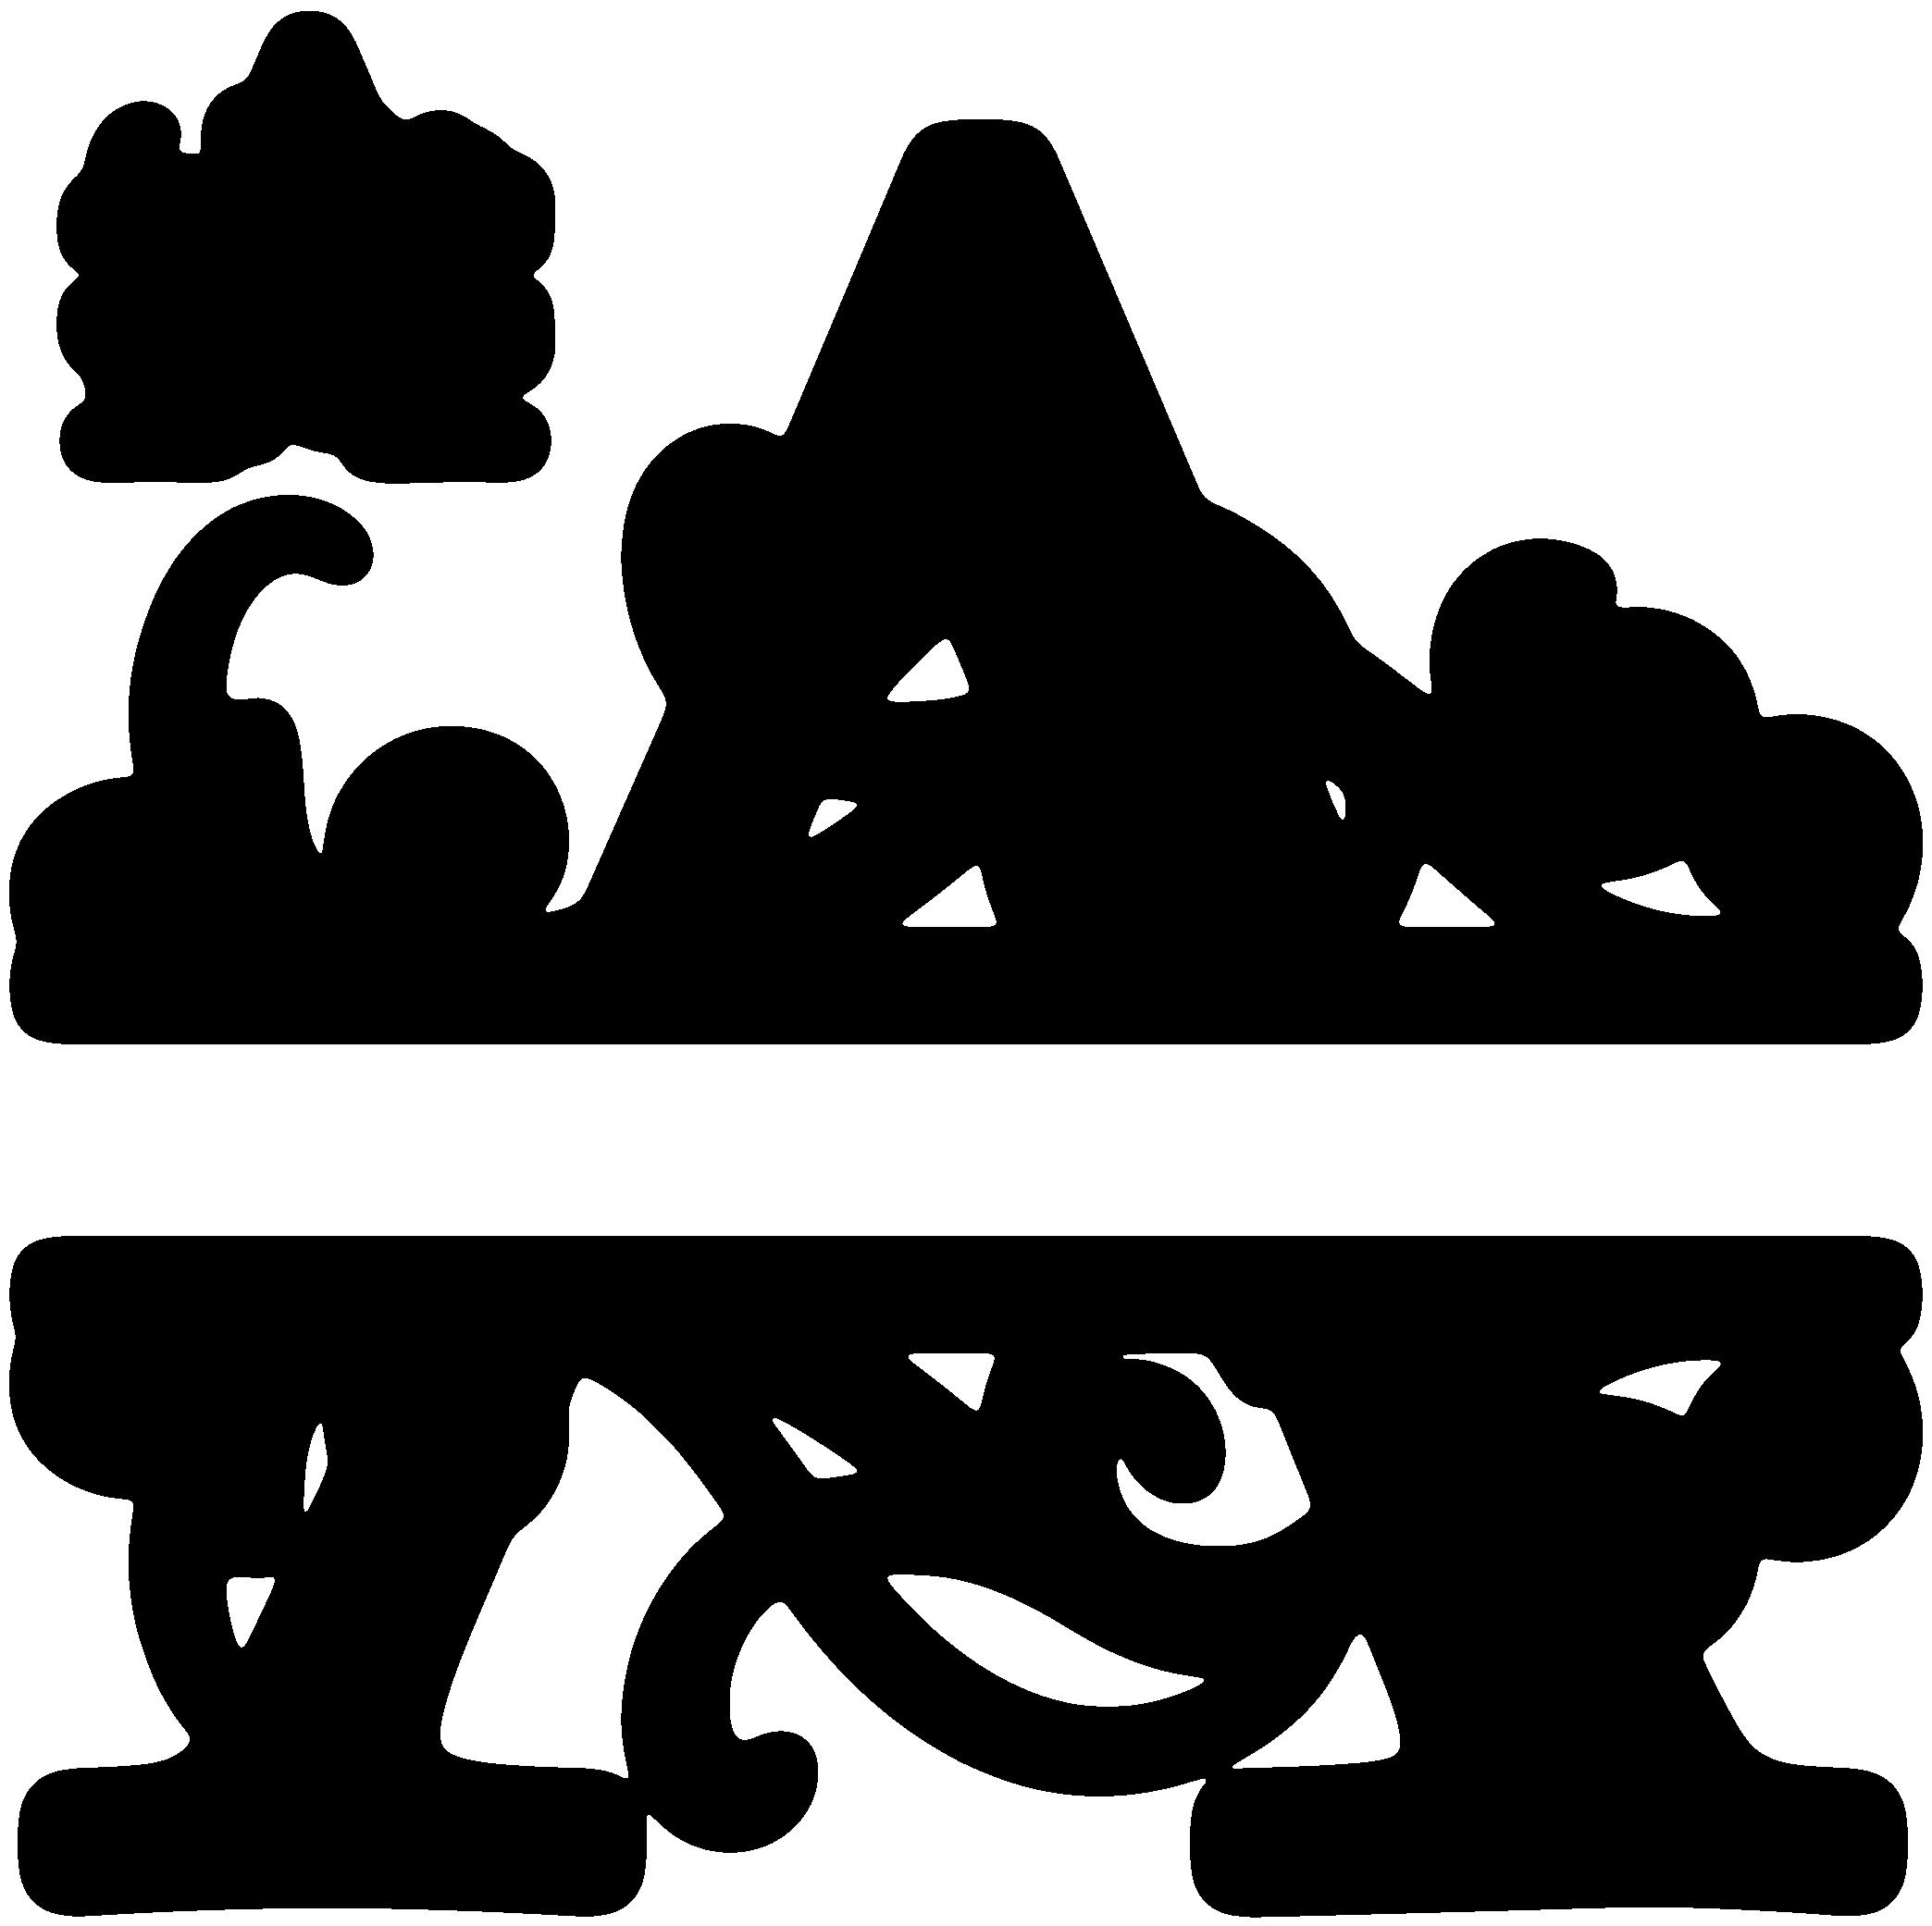 Snowflake monogram clipart picture transparent download A